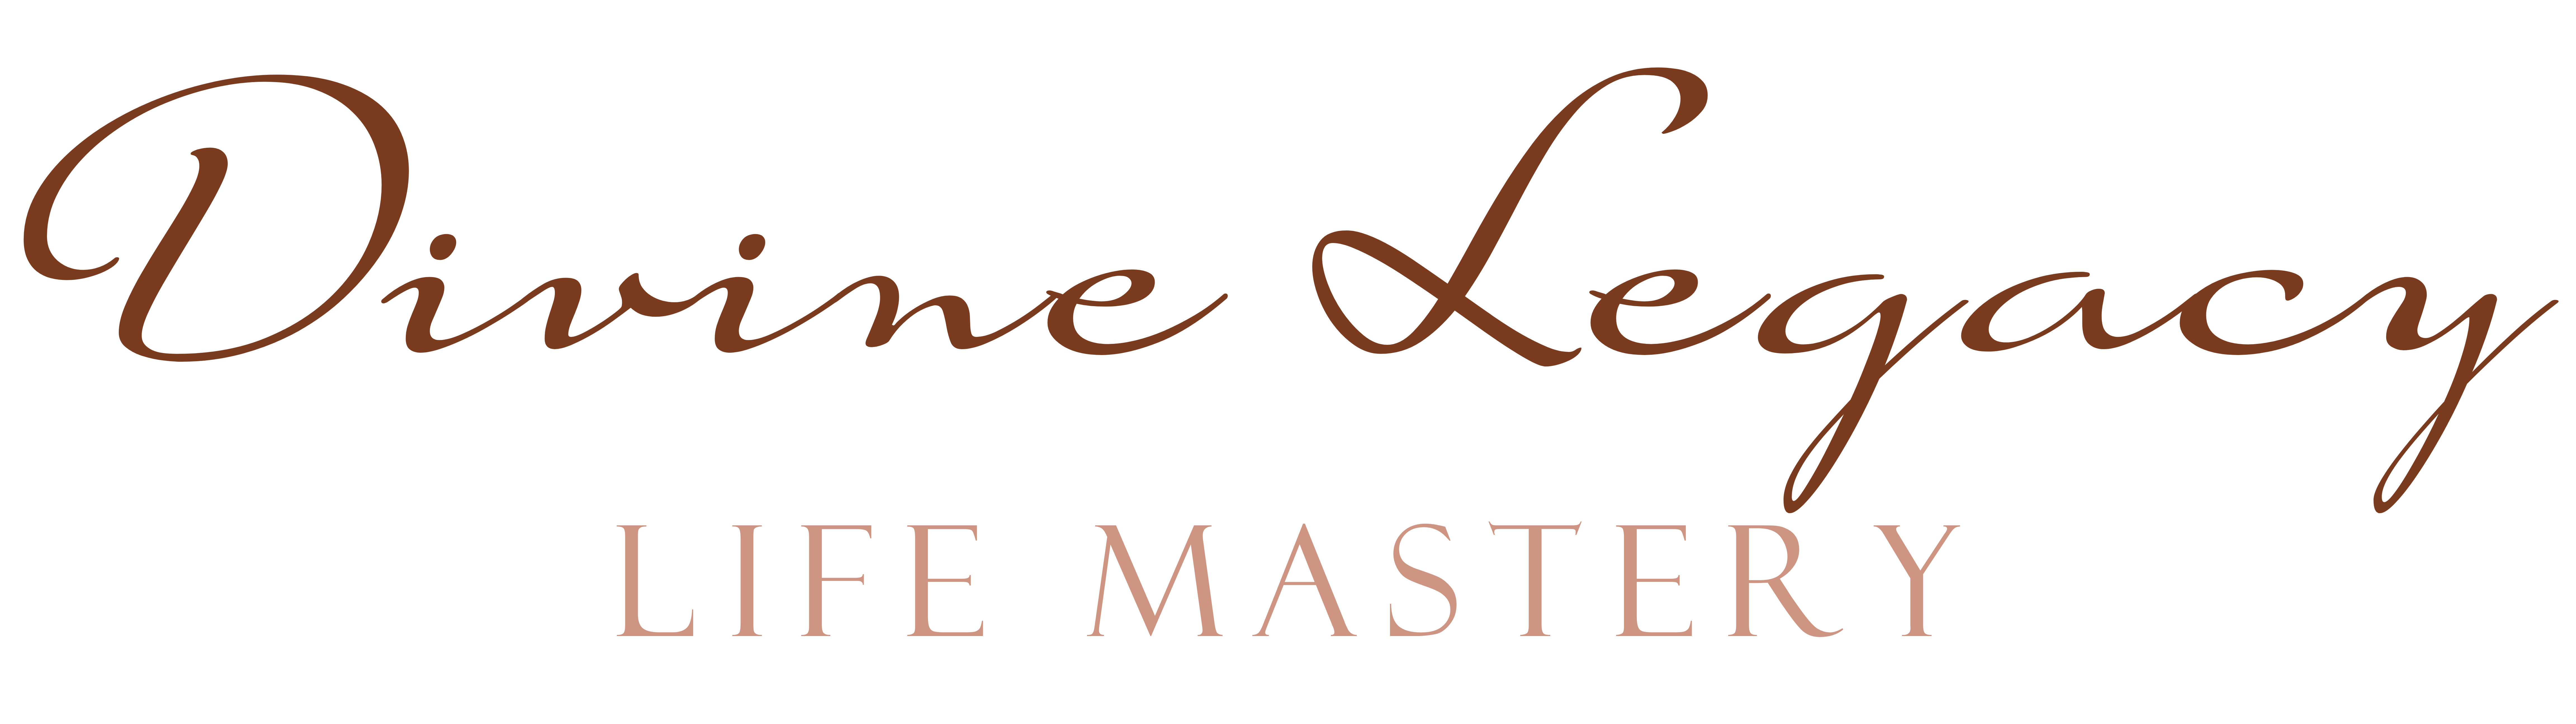 Ascending Heart Business Mastery